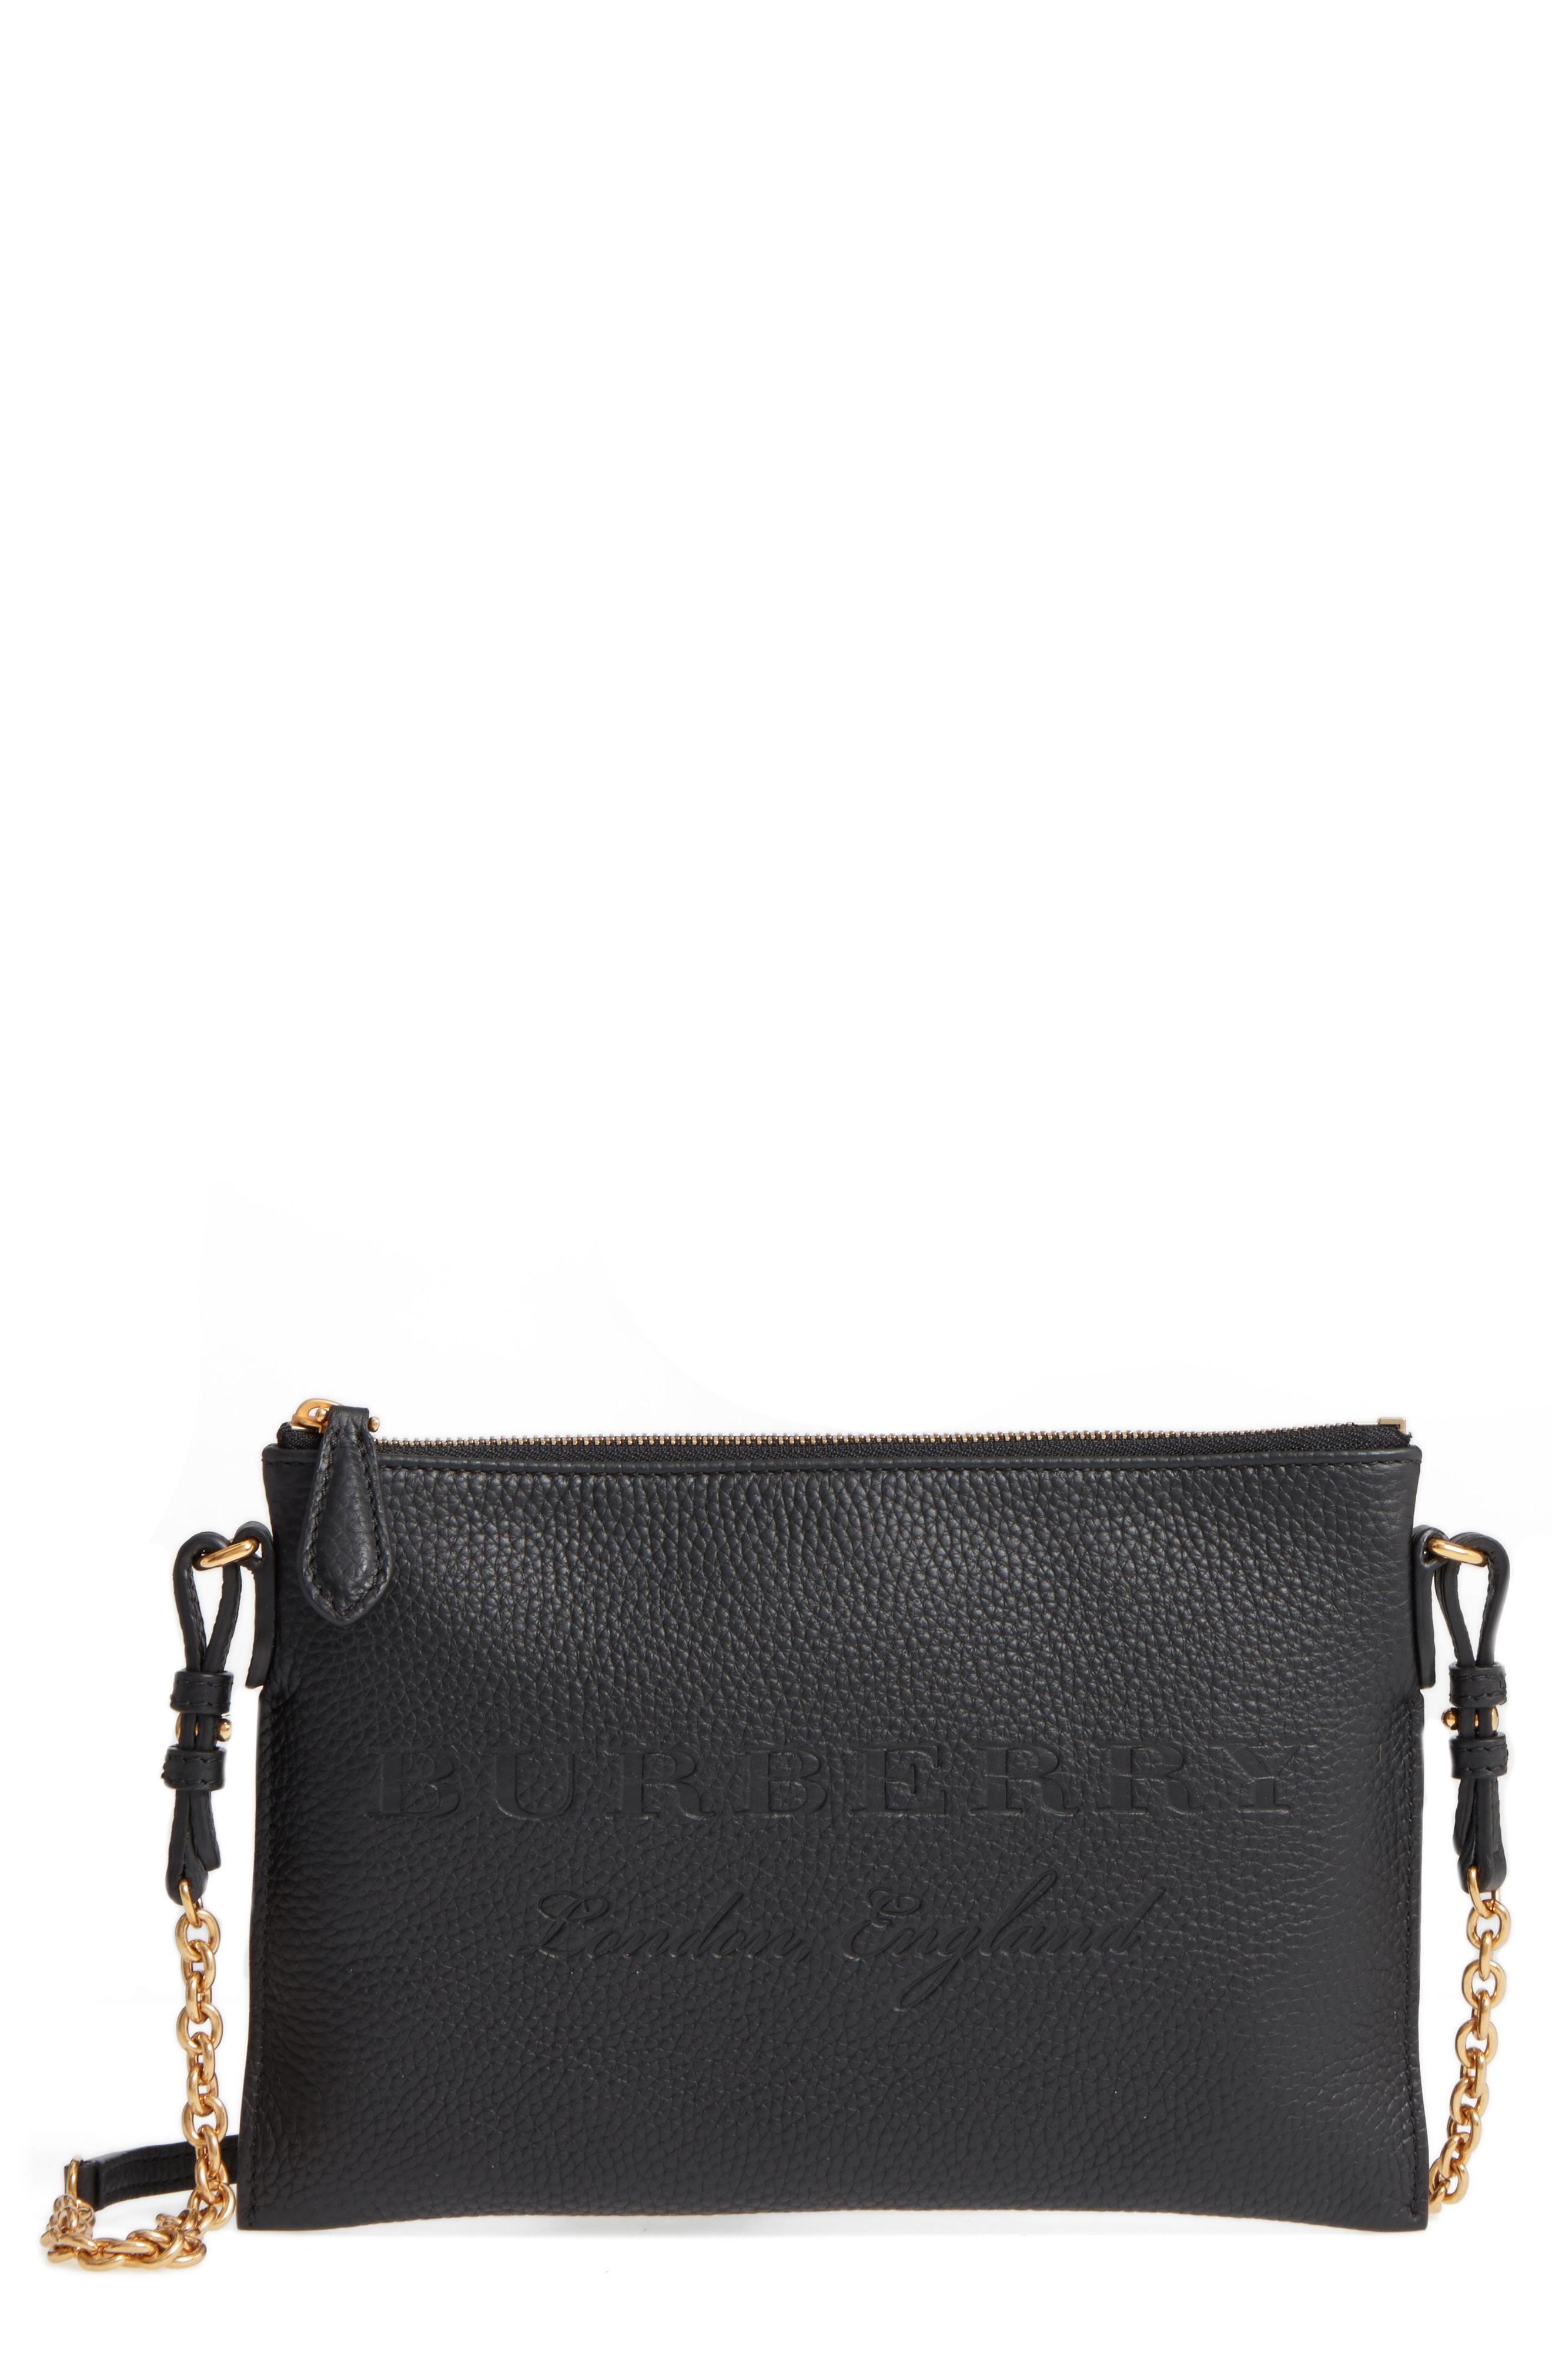 Lyst - Burberry Peyton Leather Crossbody Bag in Black 65c0bc0d2f